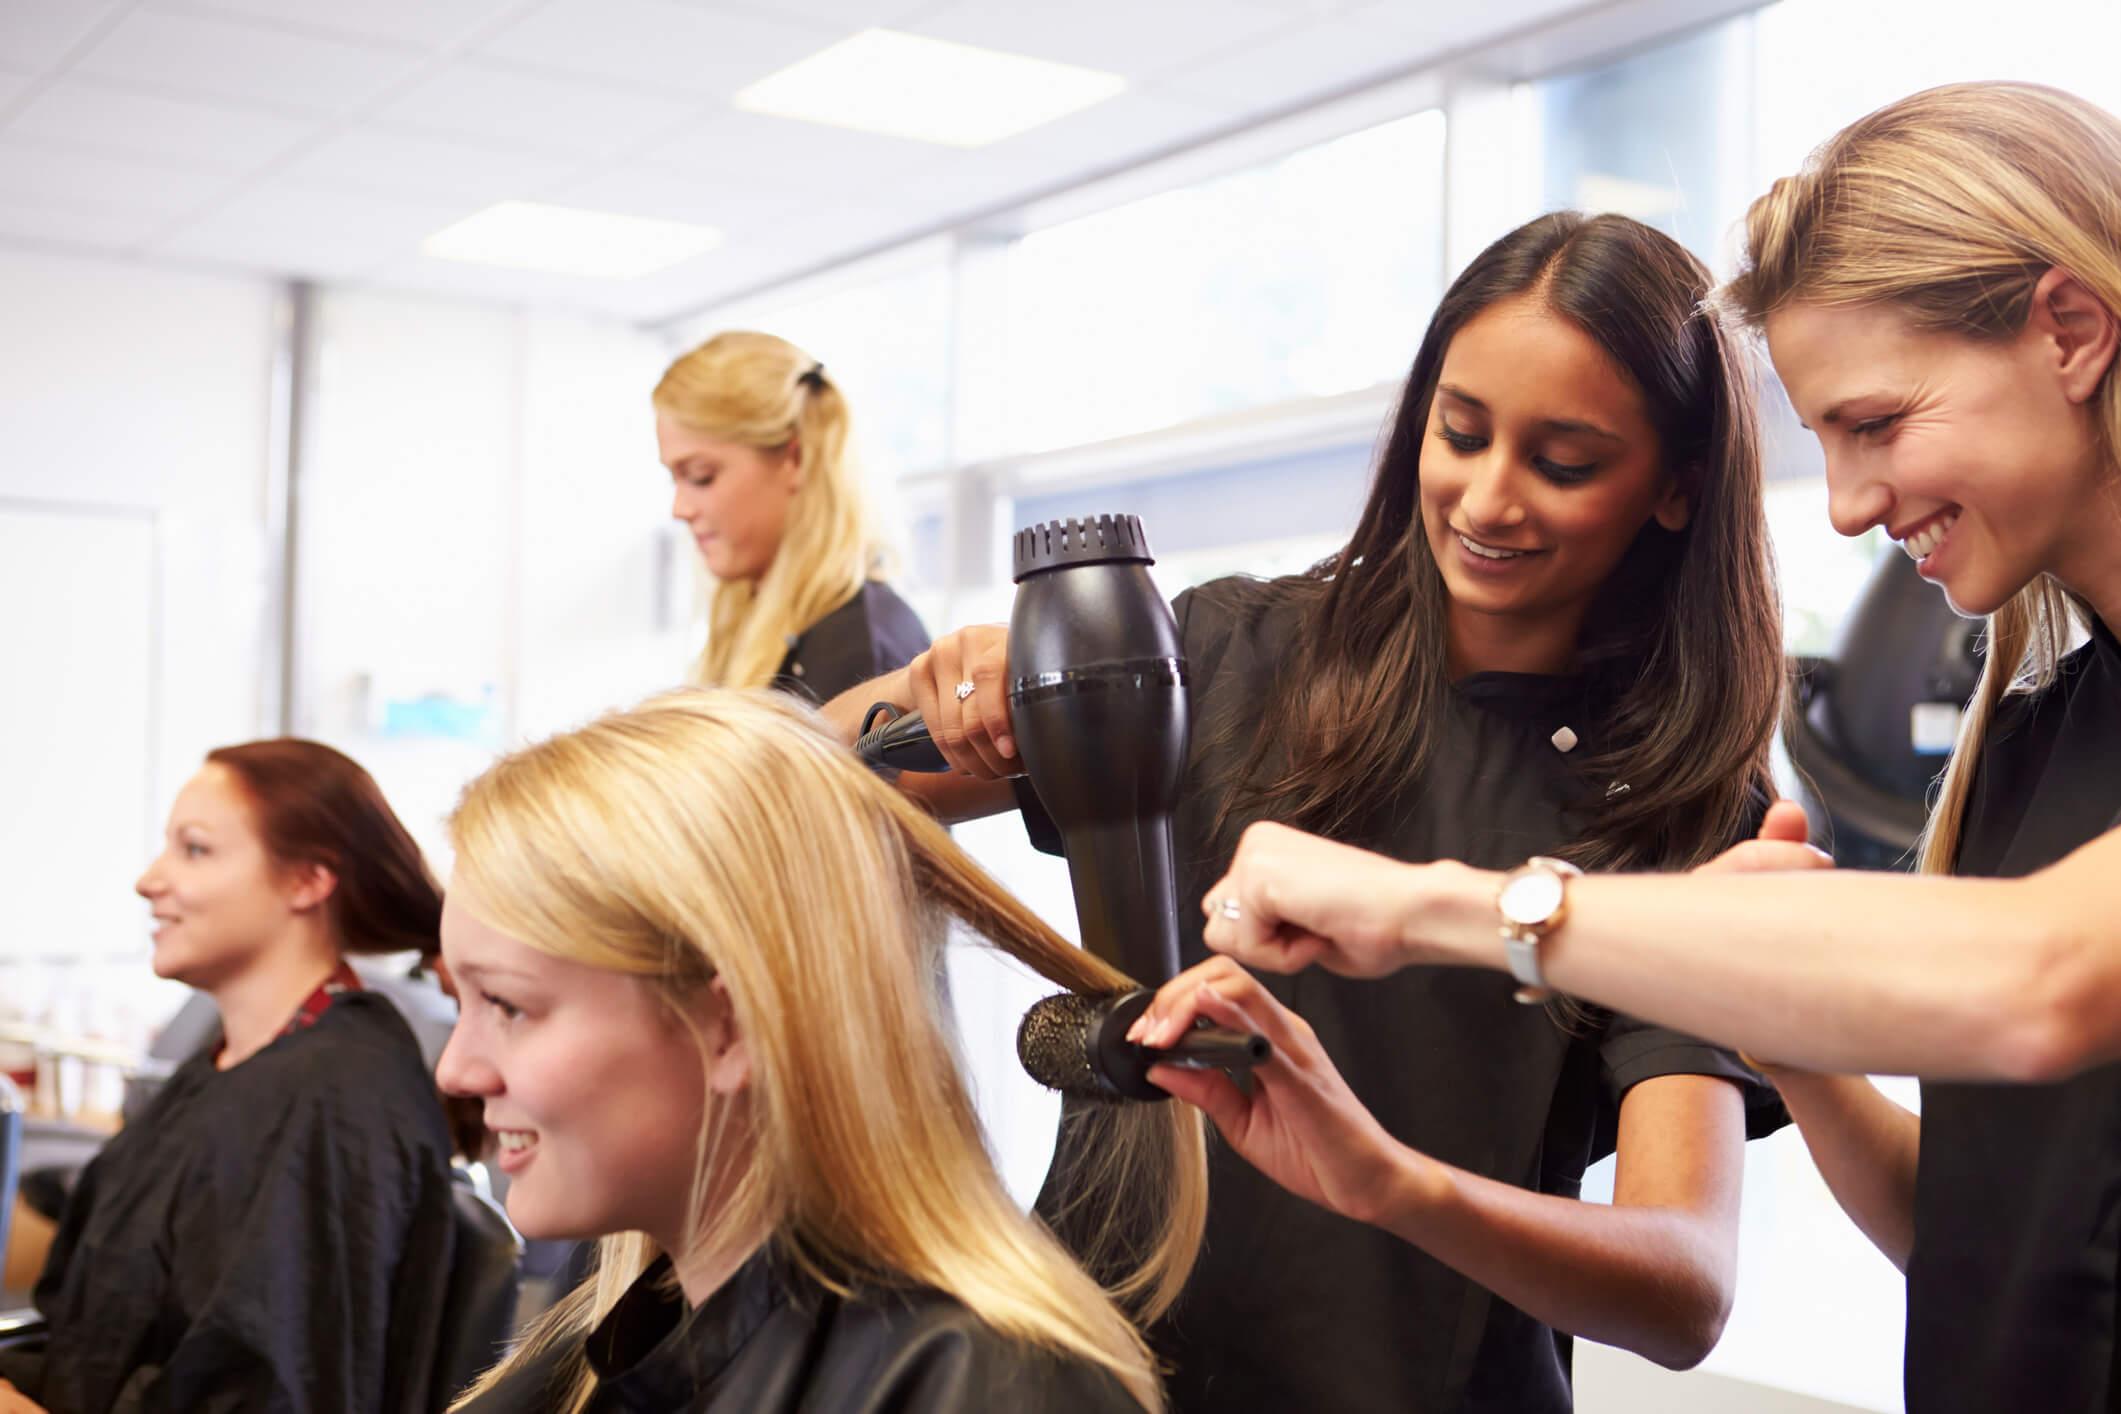 curso de cabeleireiro